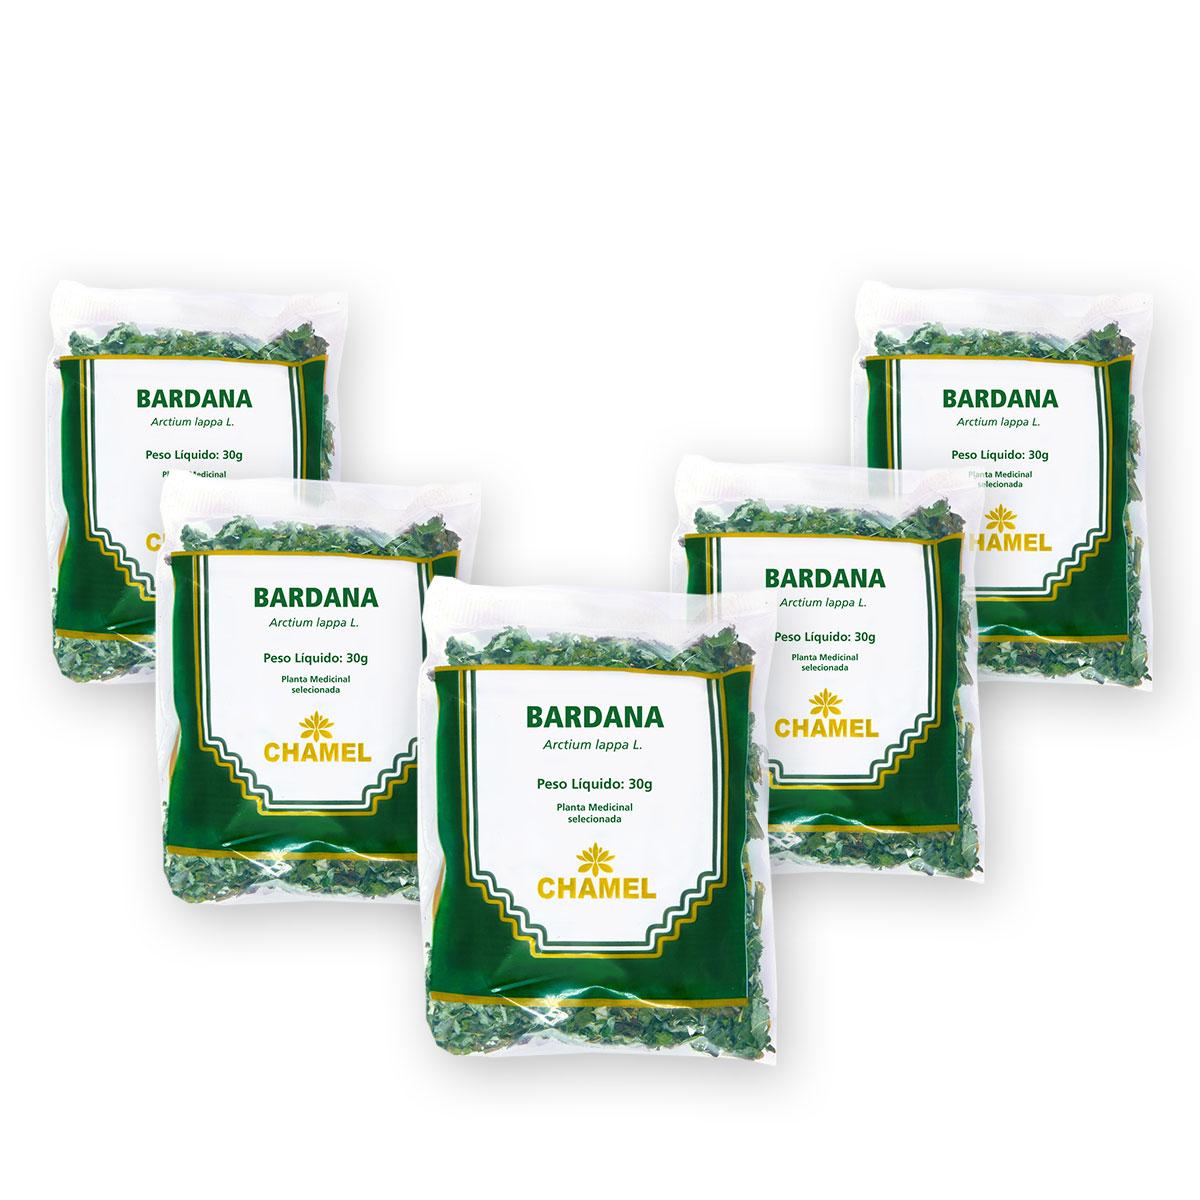 Kit Bardana 30g Chamel - Chá-Folhas